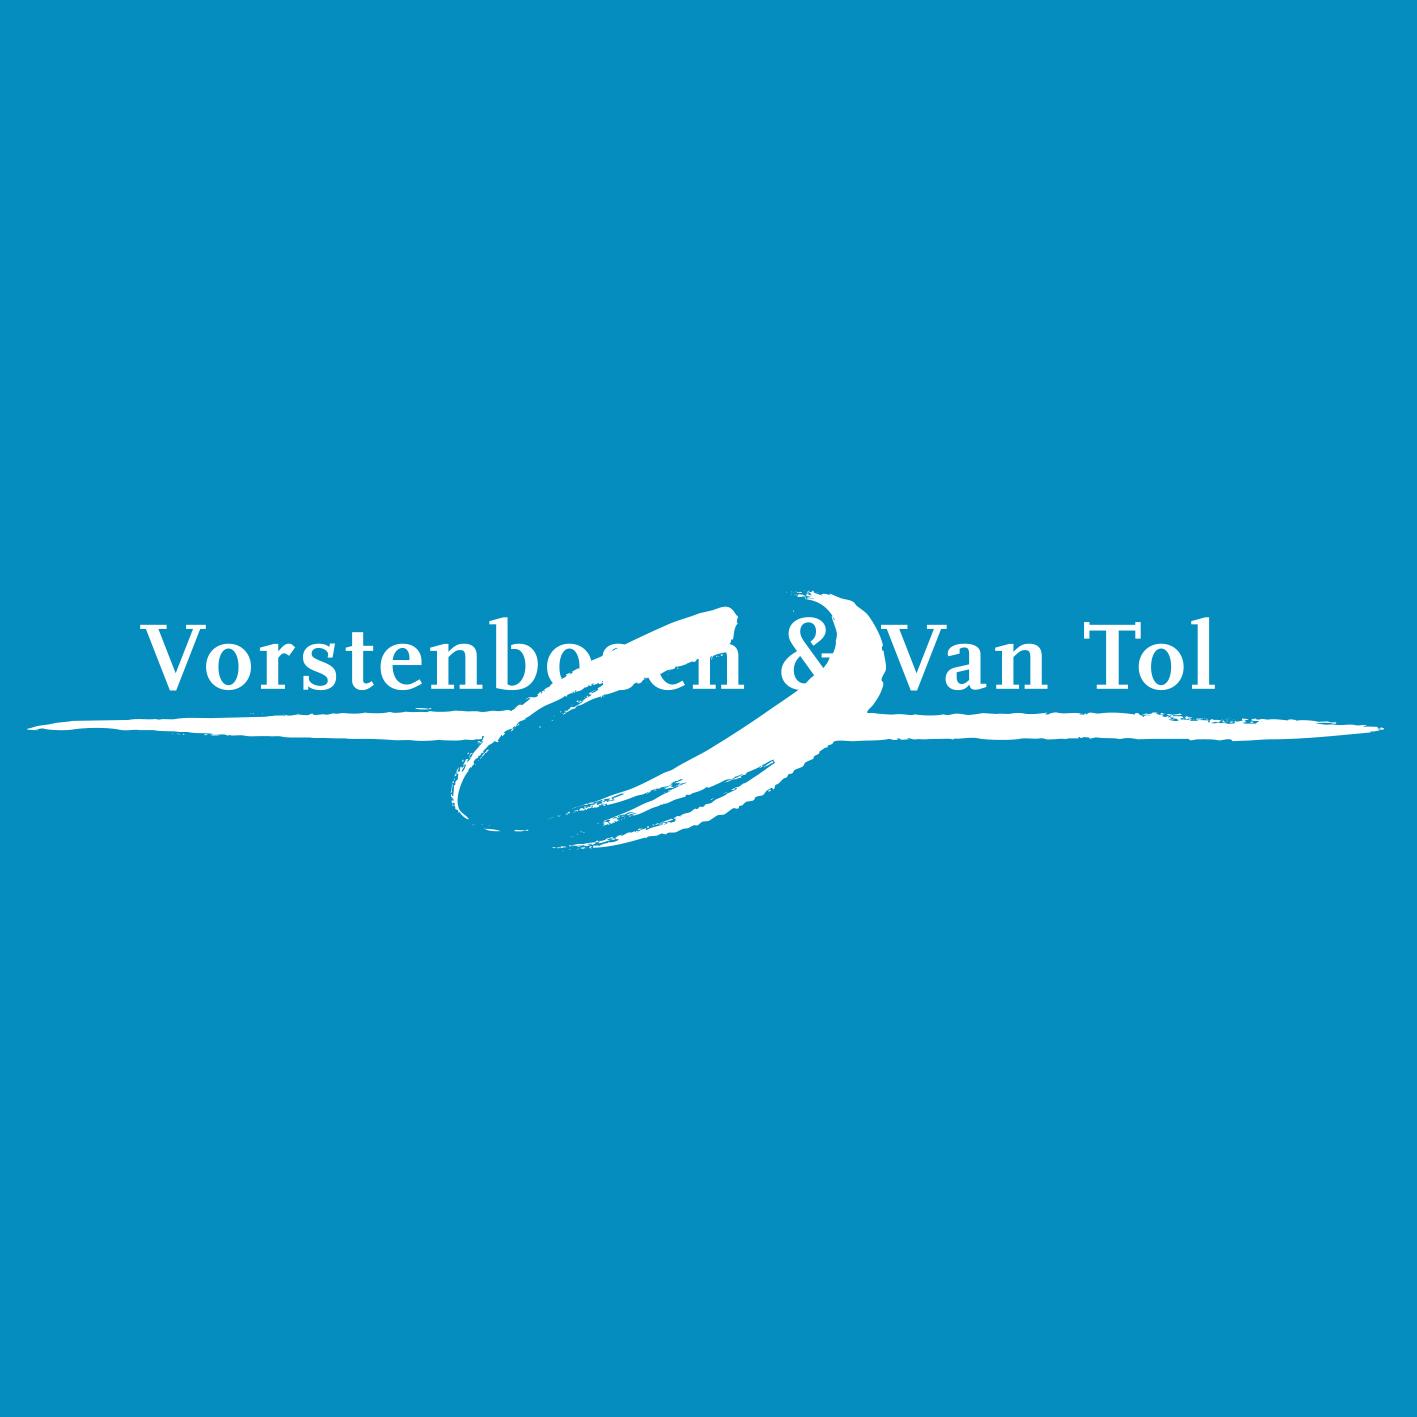 Vorstenbosch & Van Tol, ArboVita